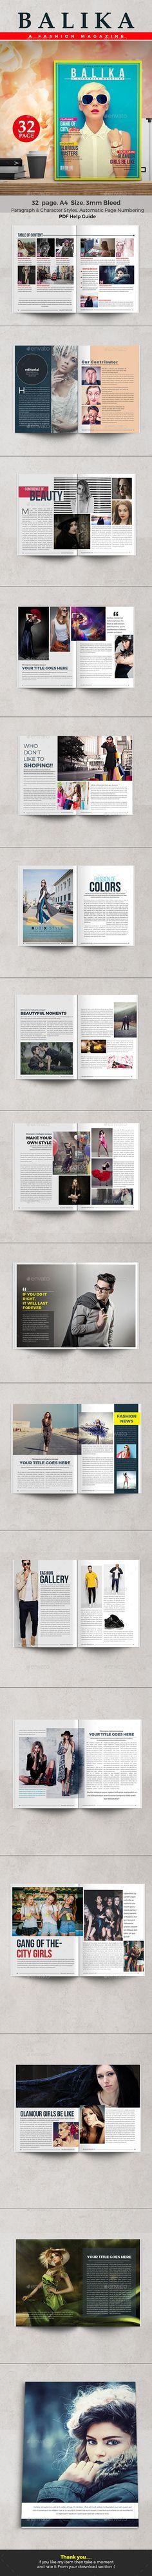 Fashion Magazine - 32 page